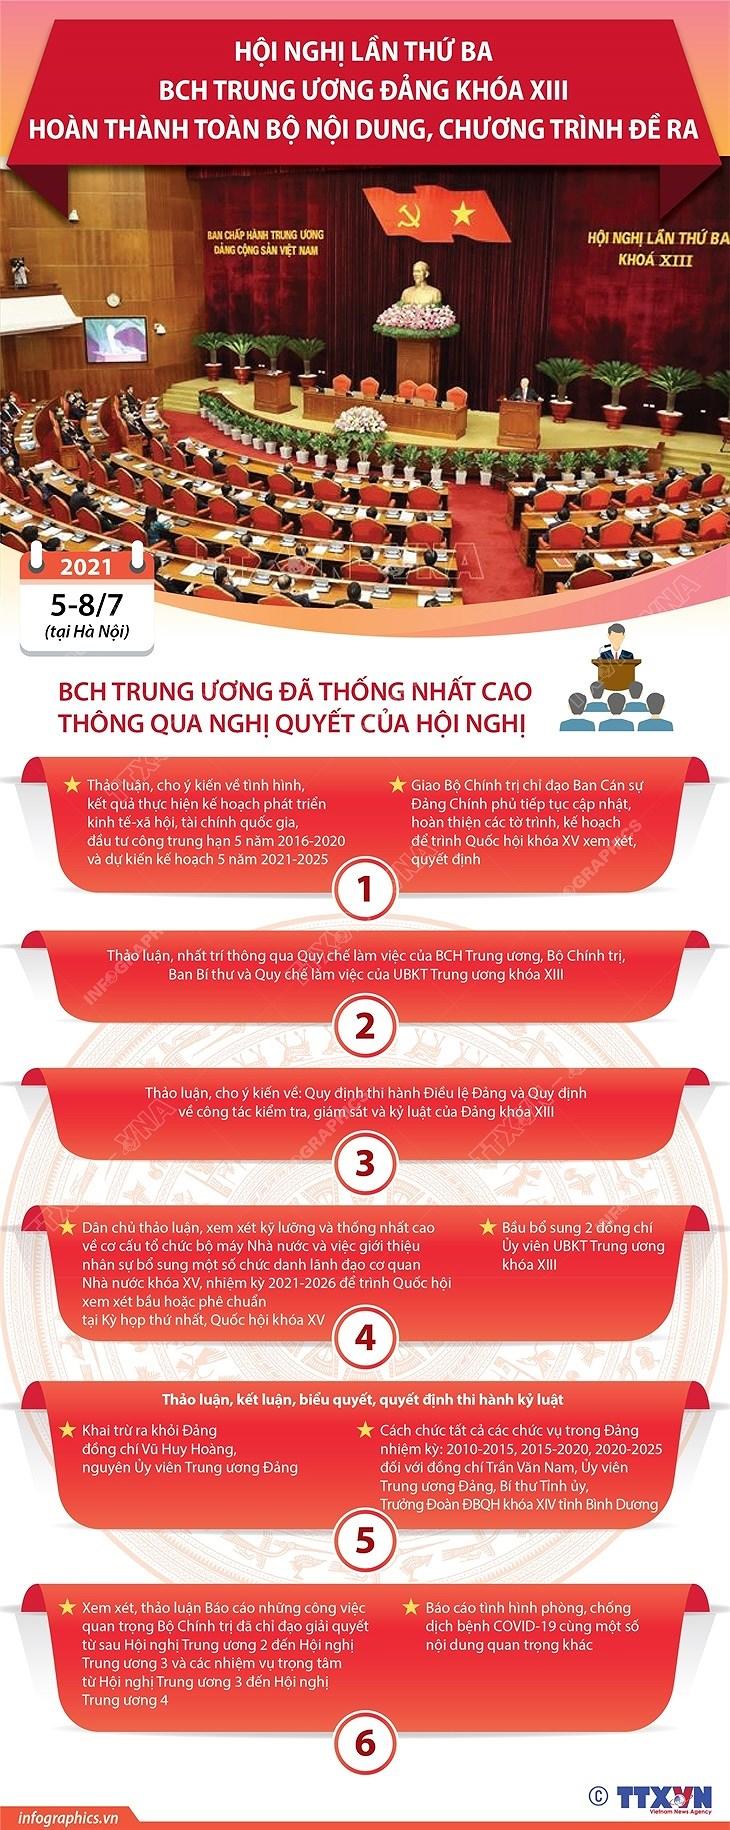 [Infographics] Hoi nghi TW 3 hoan thanh toan bo chuong trinh de ra hinh anh 1